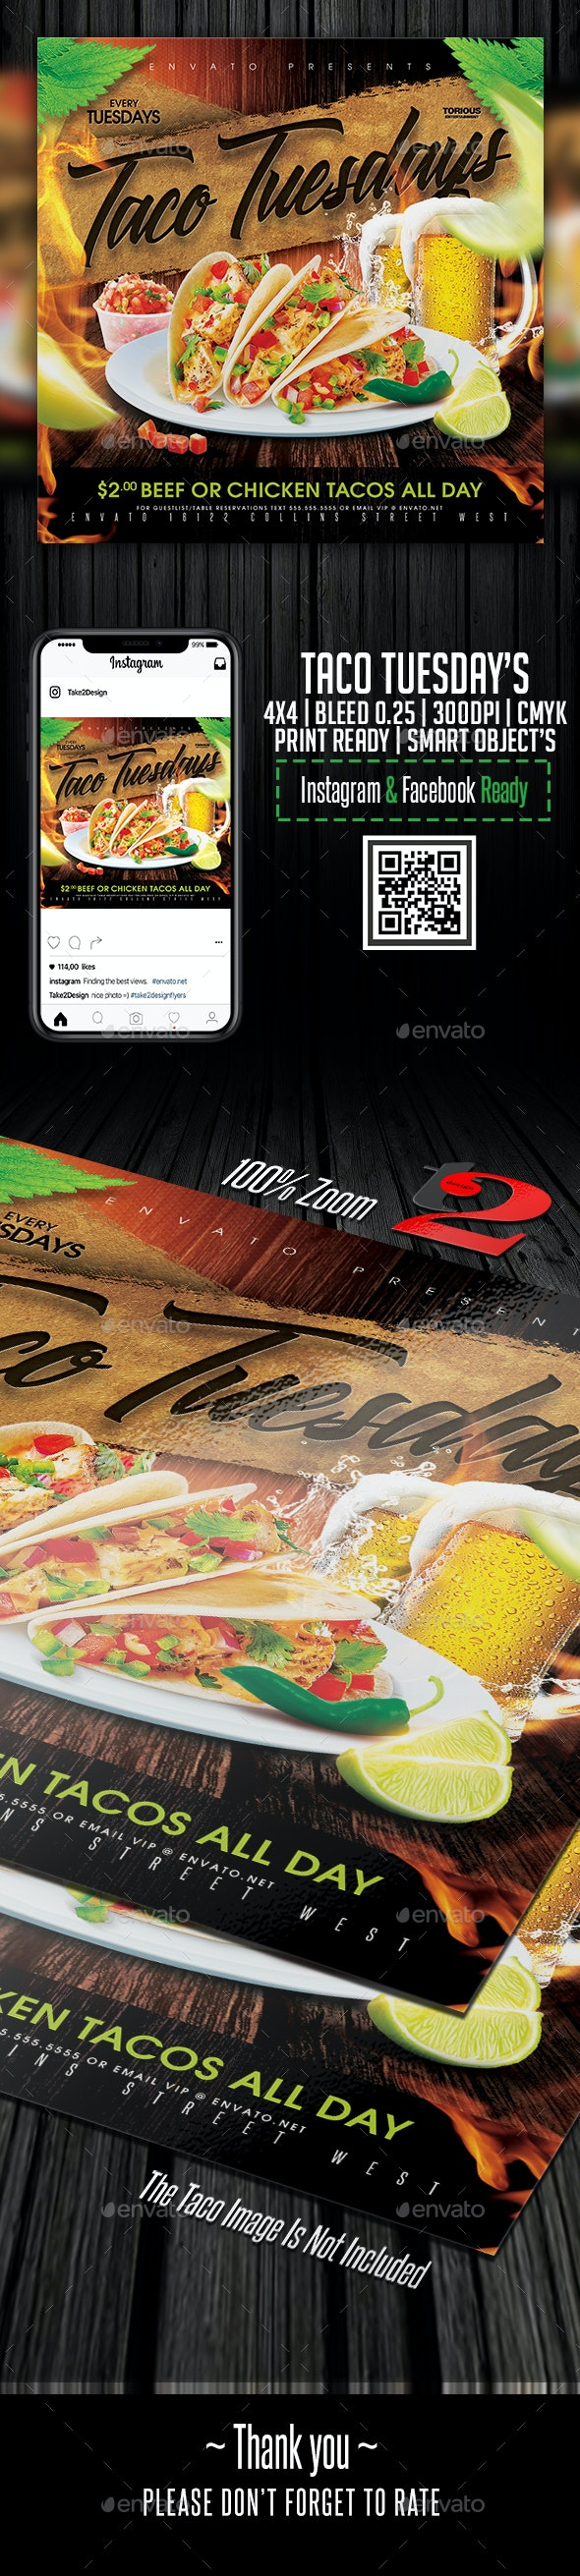 Taco Tuesday Flyer Template - Restaurant Flyers